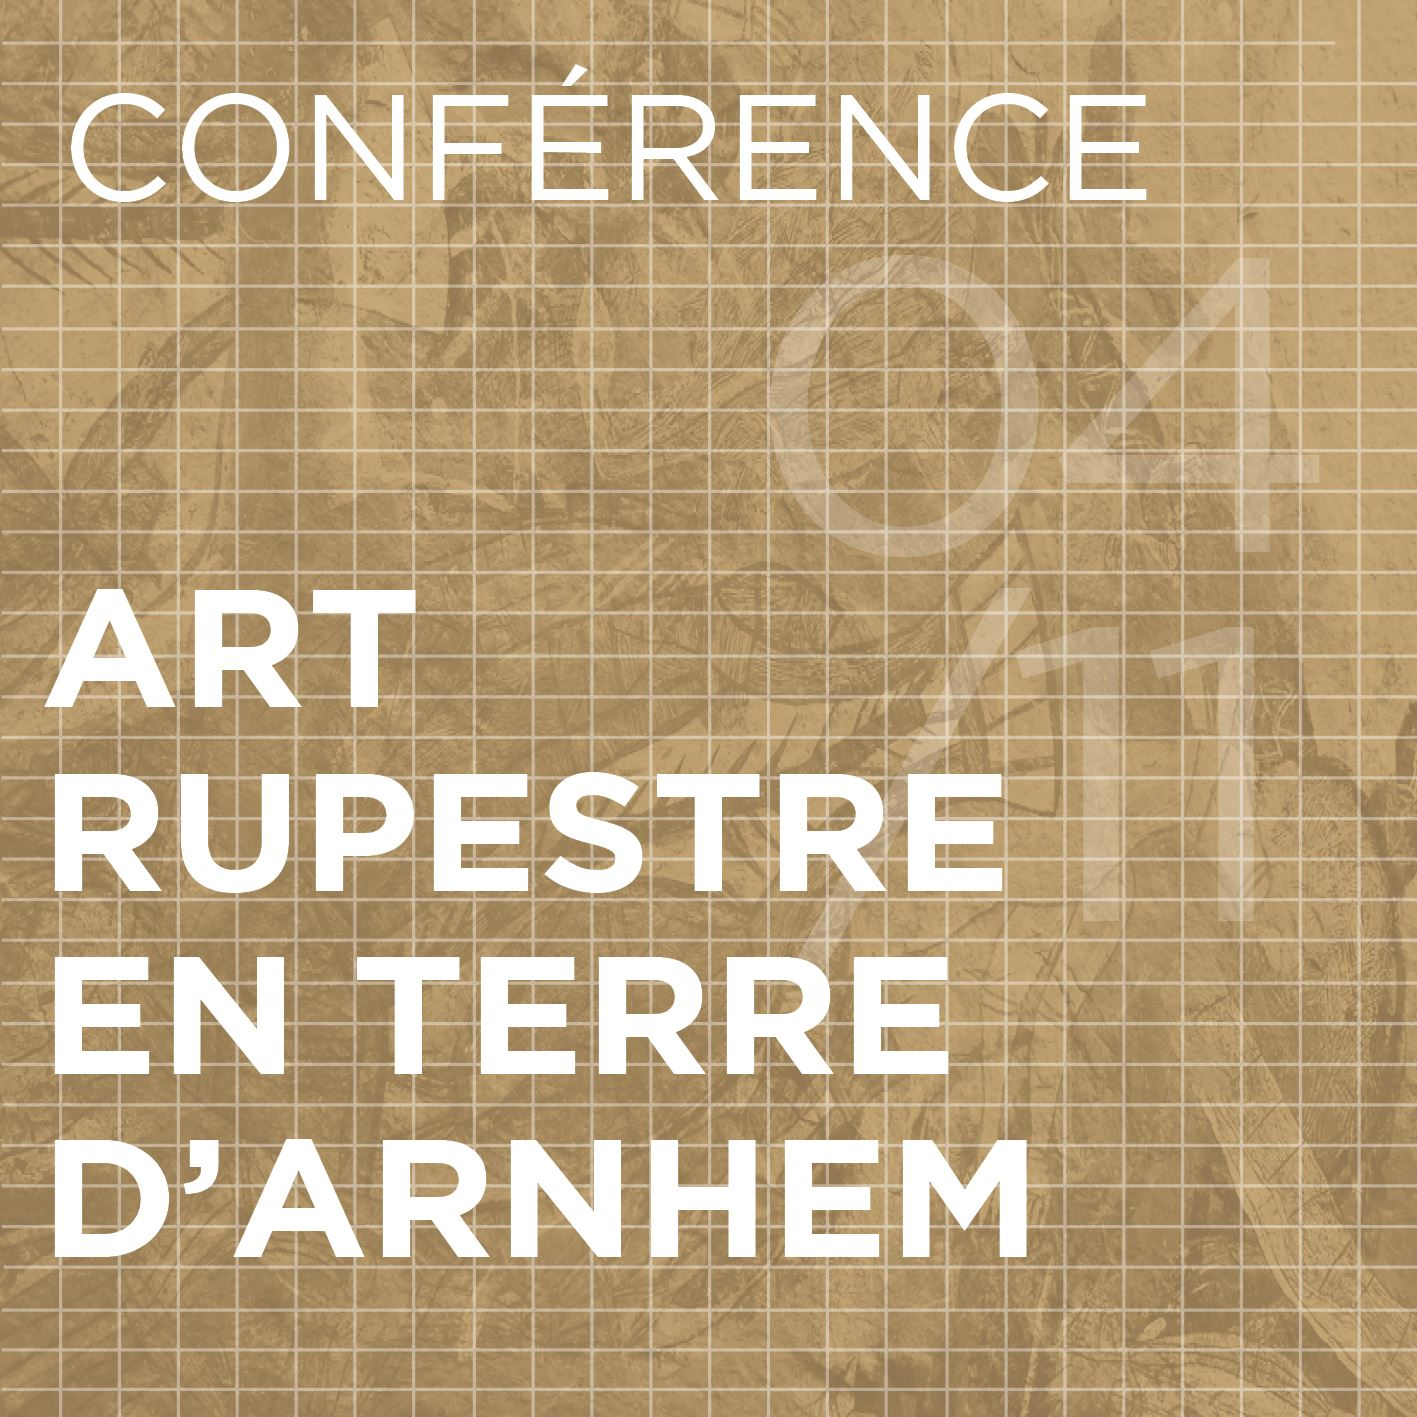 4:00 pm Conference at Lascaux international center